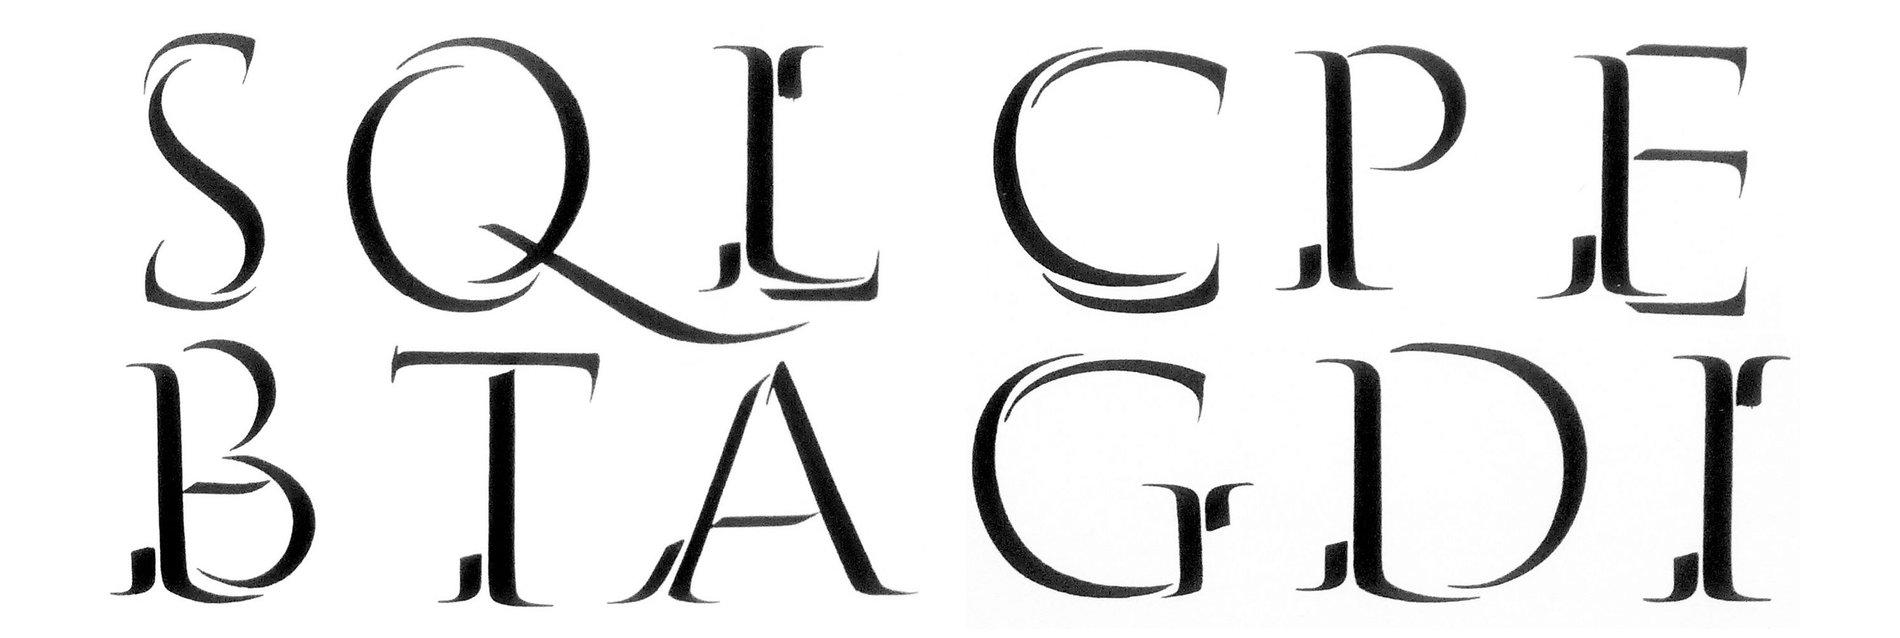 Malee-case-Catich-v2